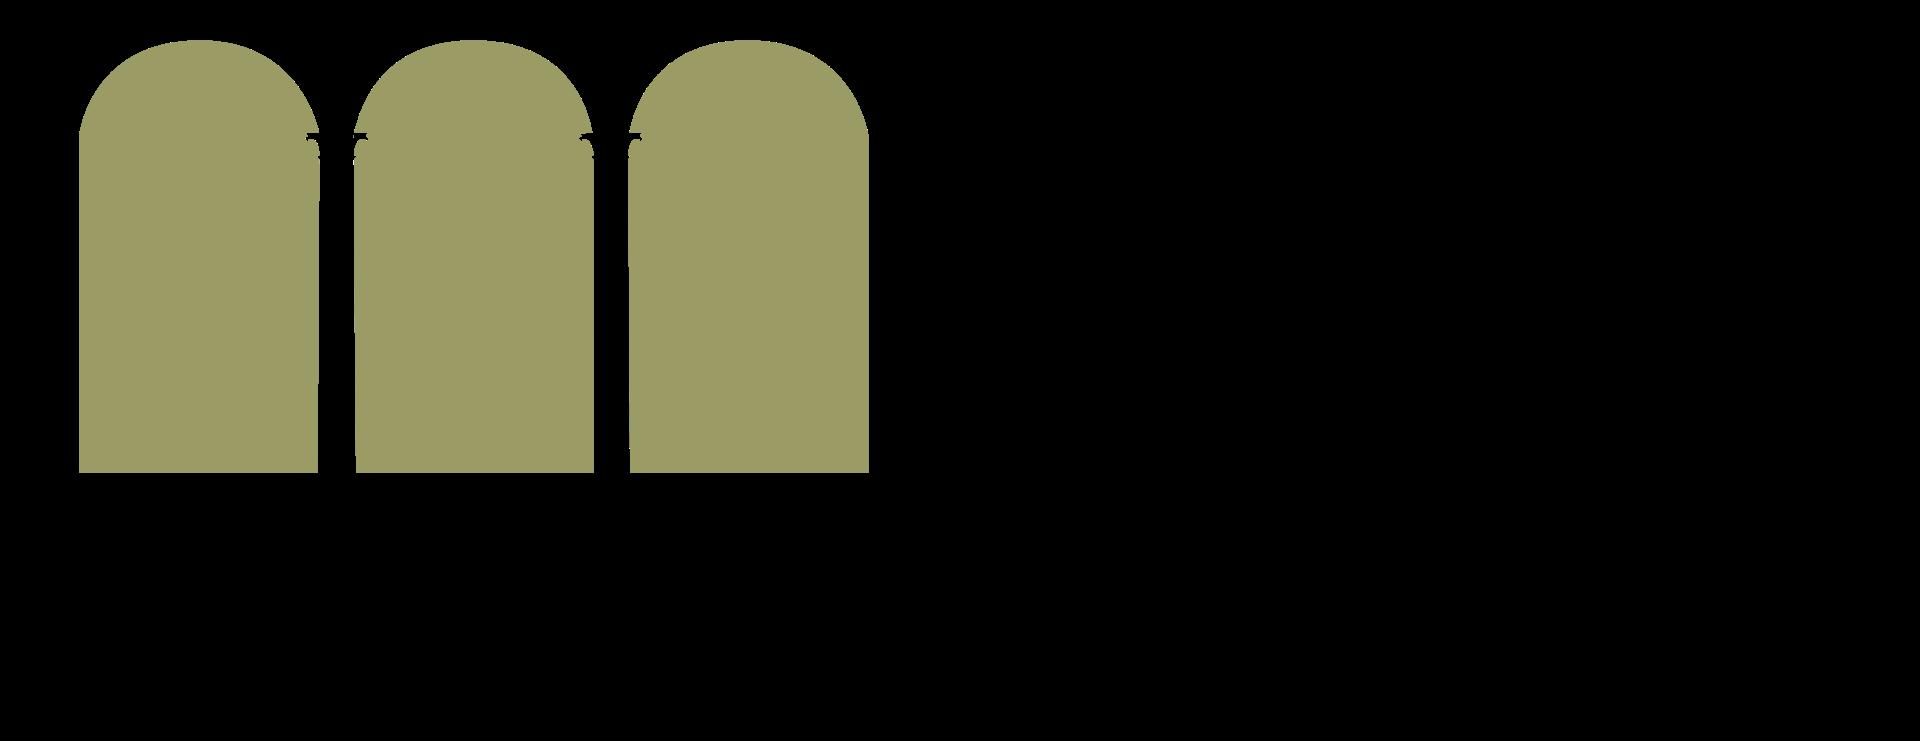 ahc_logo_new